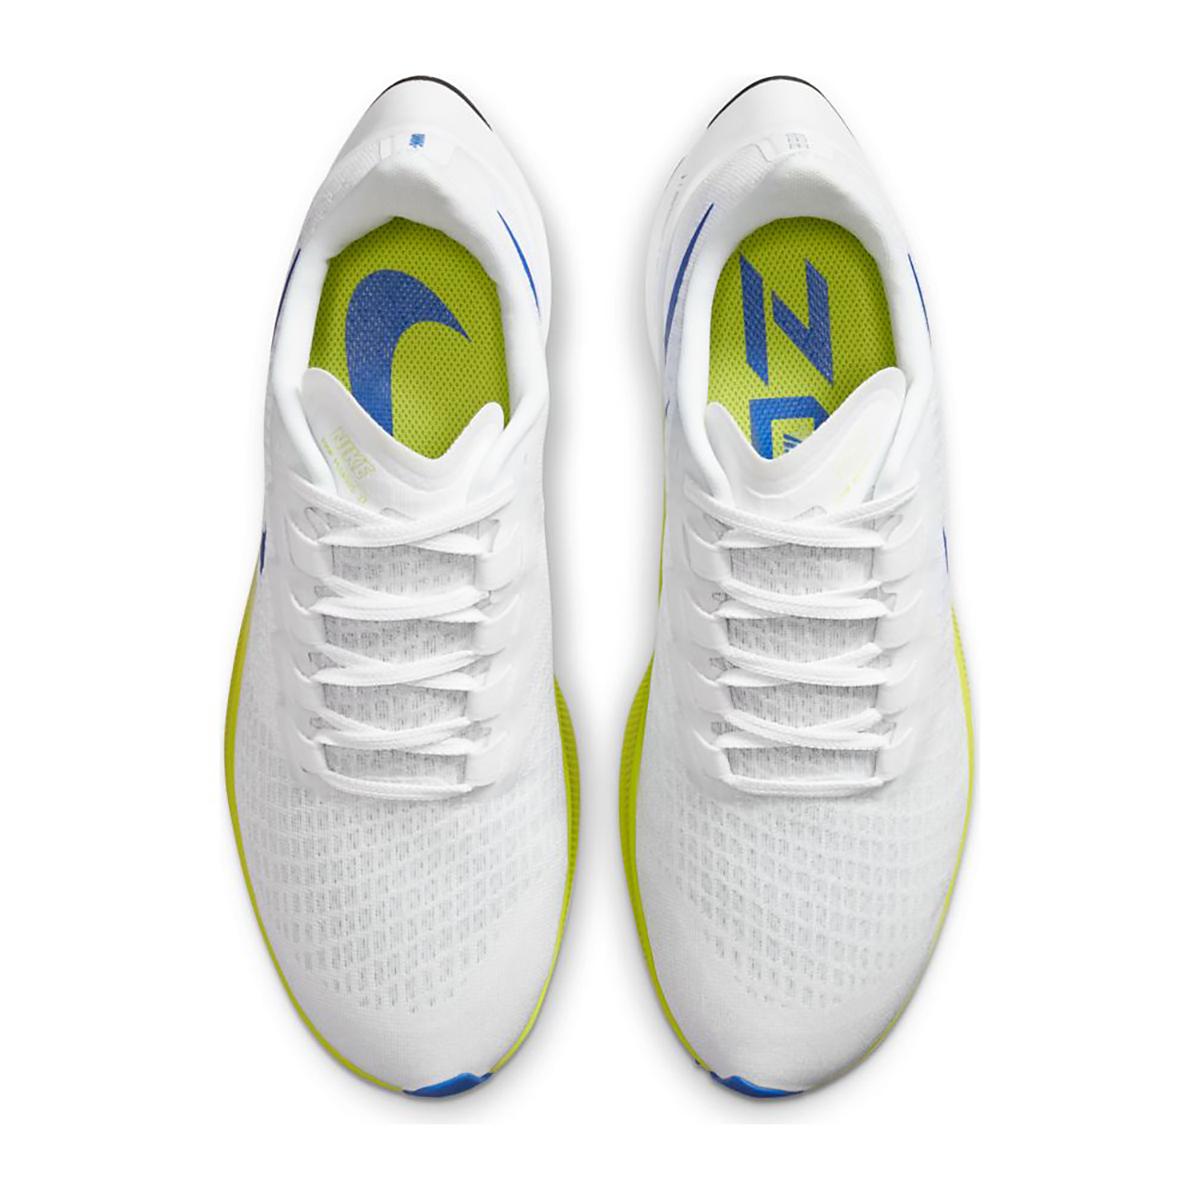 Men's Nike Nike Air Zoom Pegasus 37 Running Shoe - Color: White/Racer Blue/Cyber/Black - Size: 6 - Width: Regular, White/Racer Blue/Cyber/Black, large, image 4